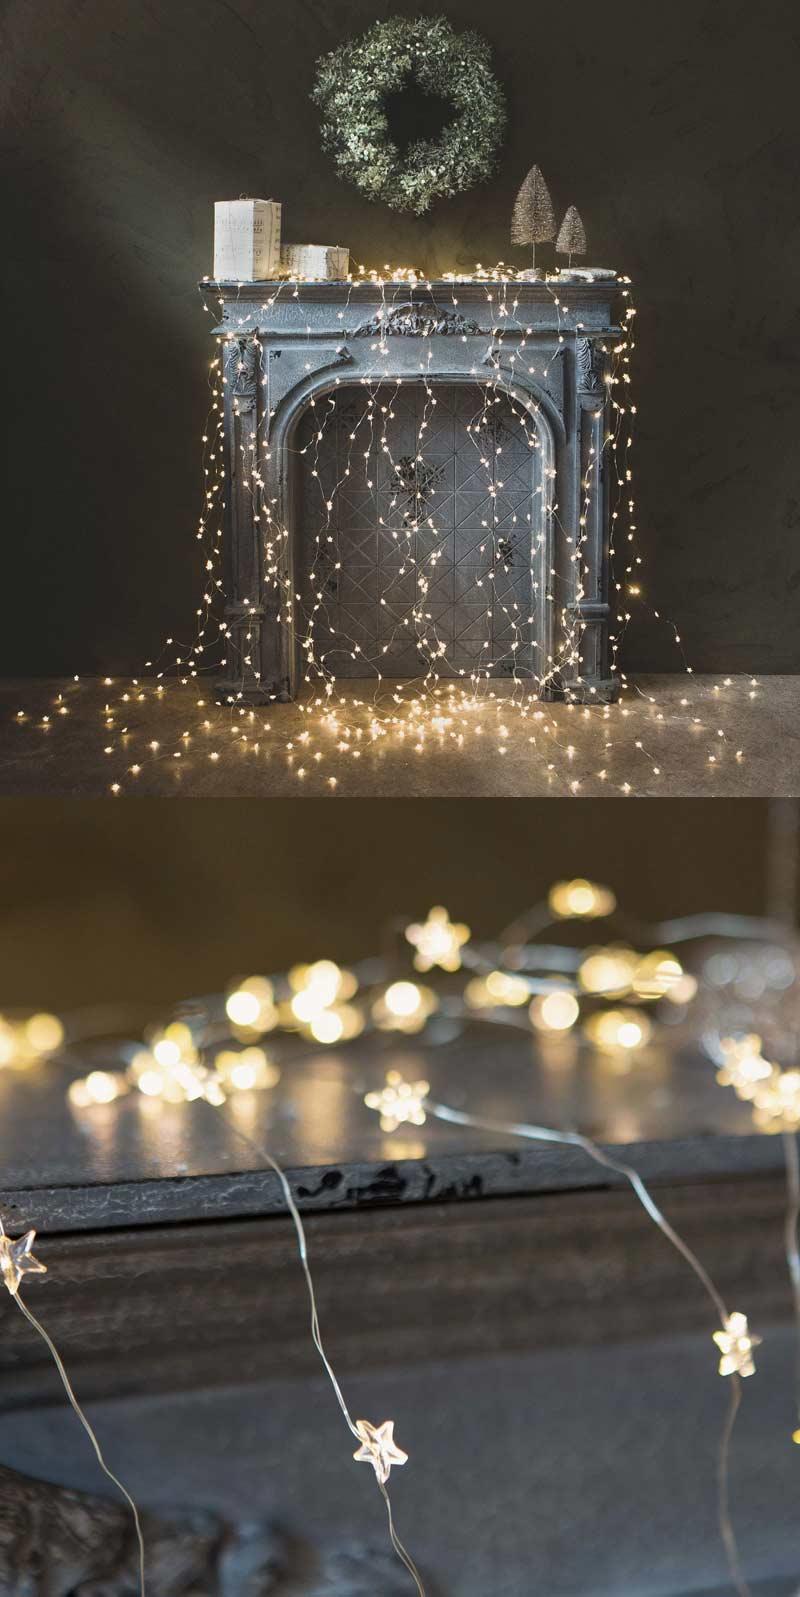 Christmas Star Lights string